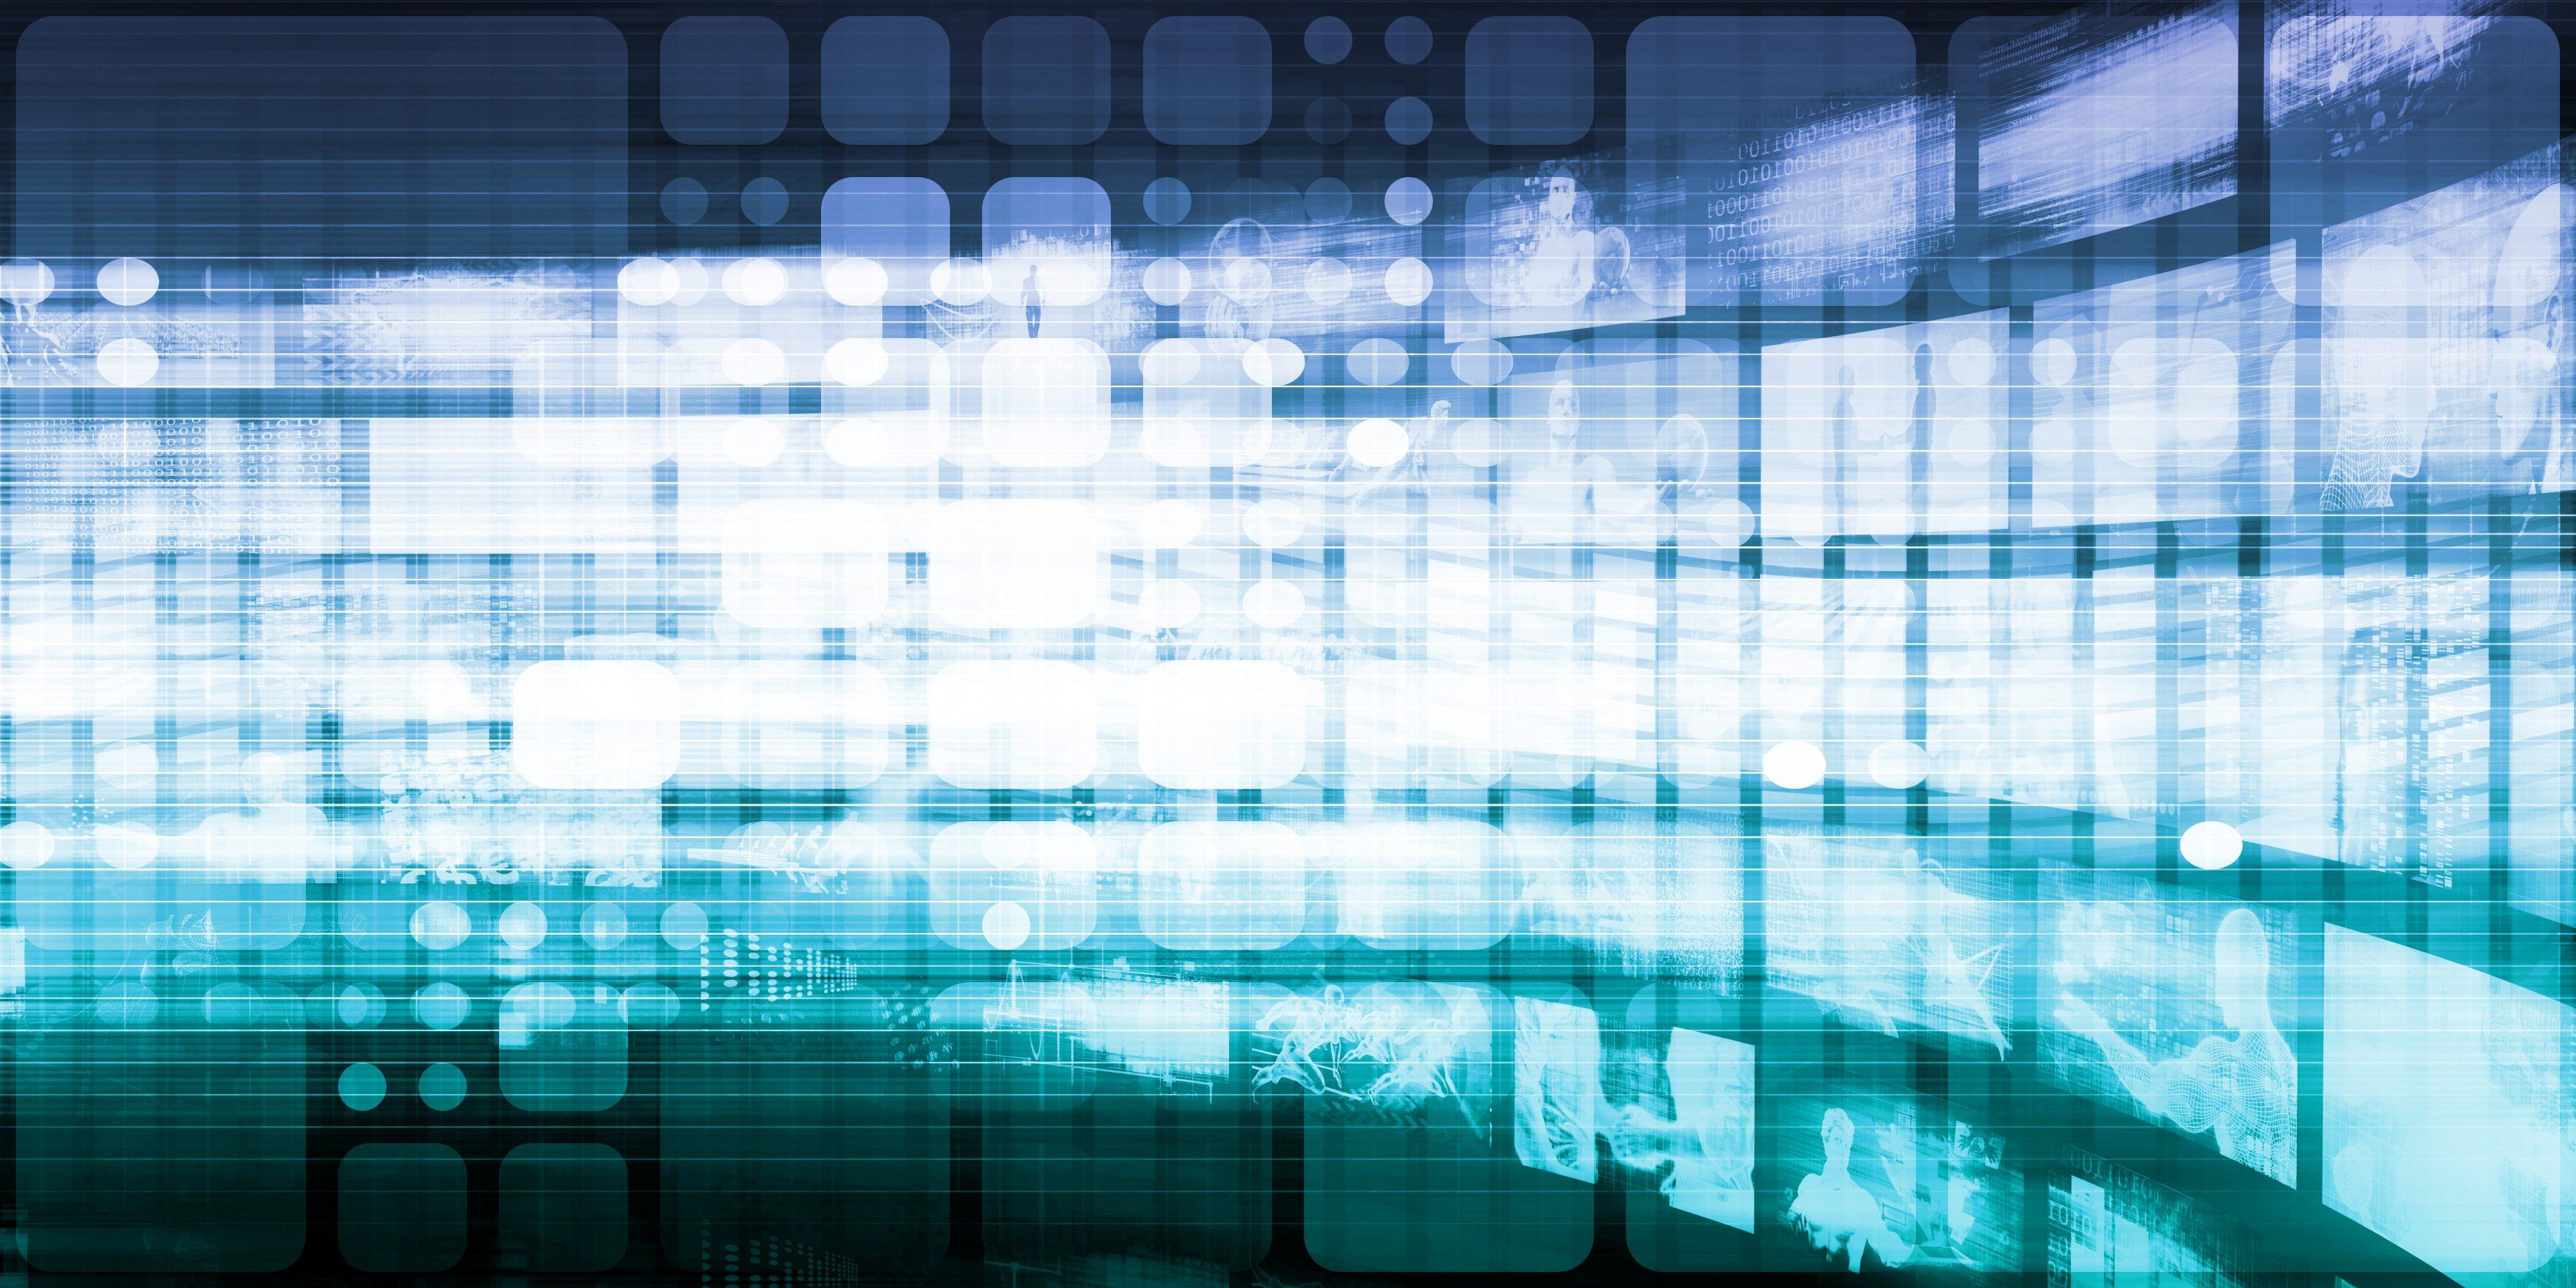 Tealium Talks Customer Data Platforms with CDP Institute Founder David Raab